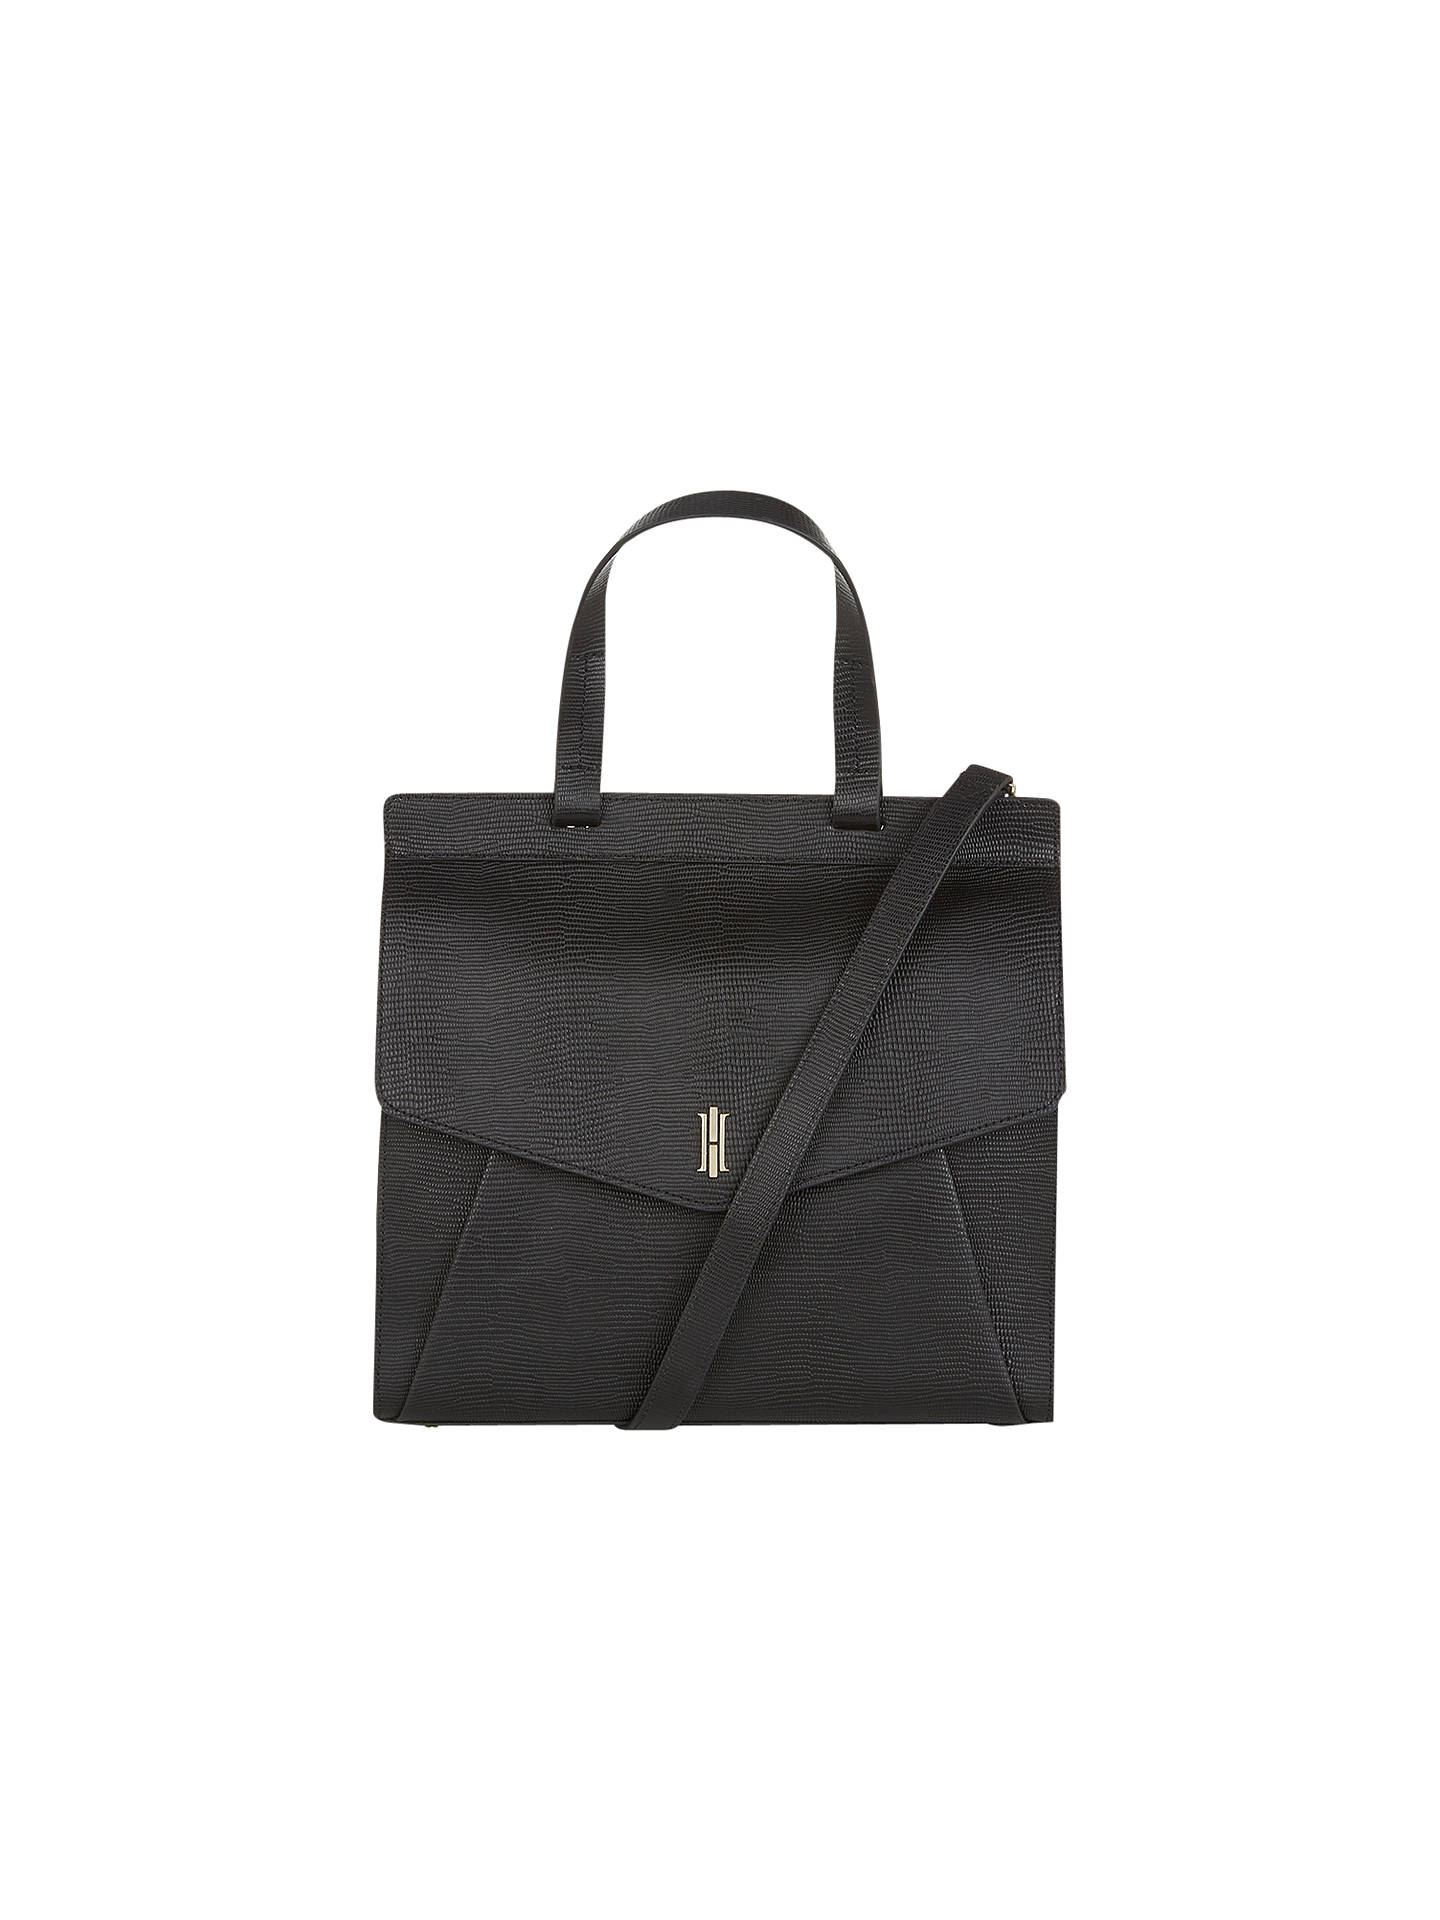 282be29bfcc0 Hobbs Alderley Leather Grab Bag at John Lewis   Partners